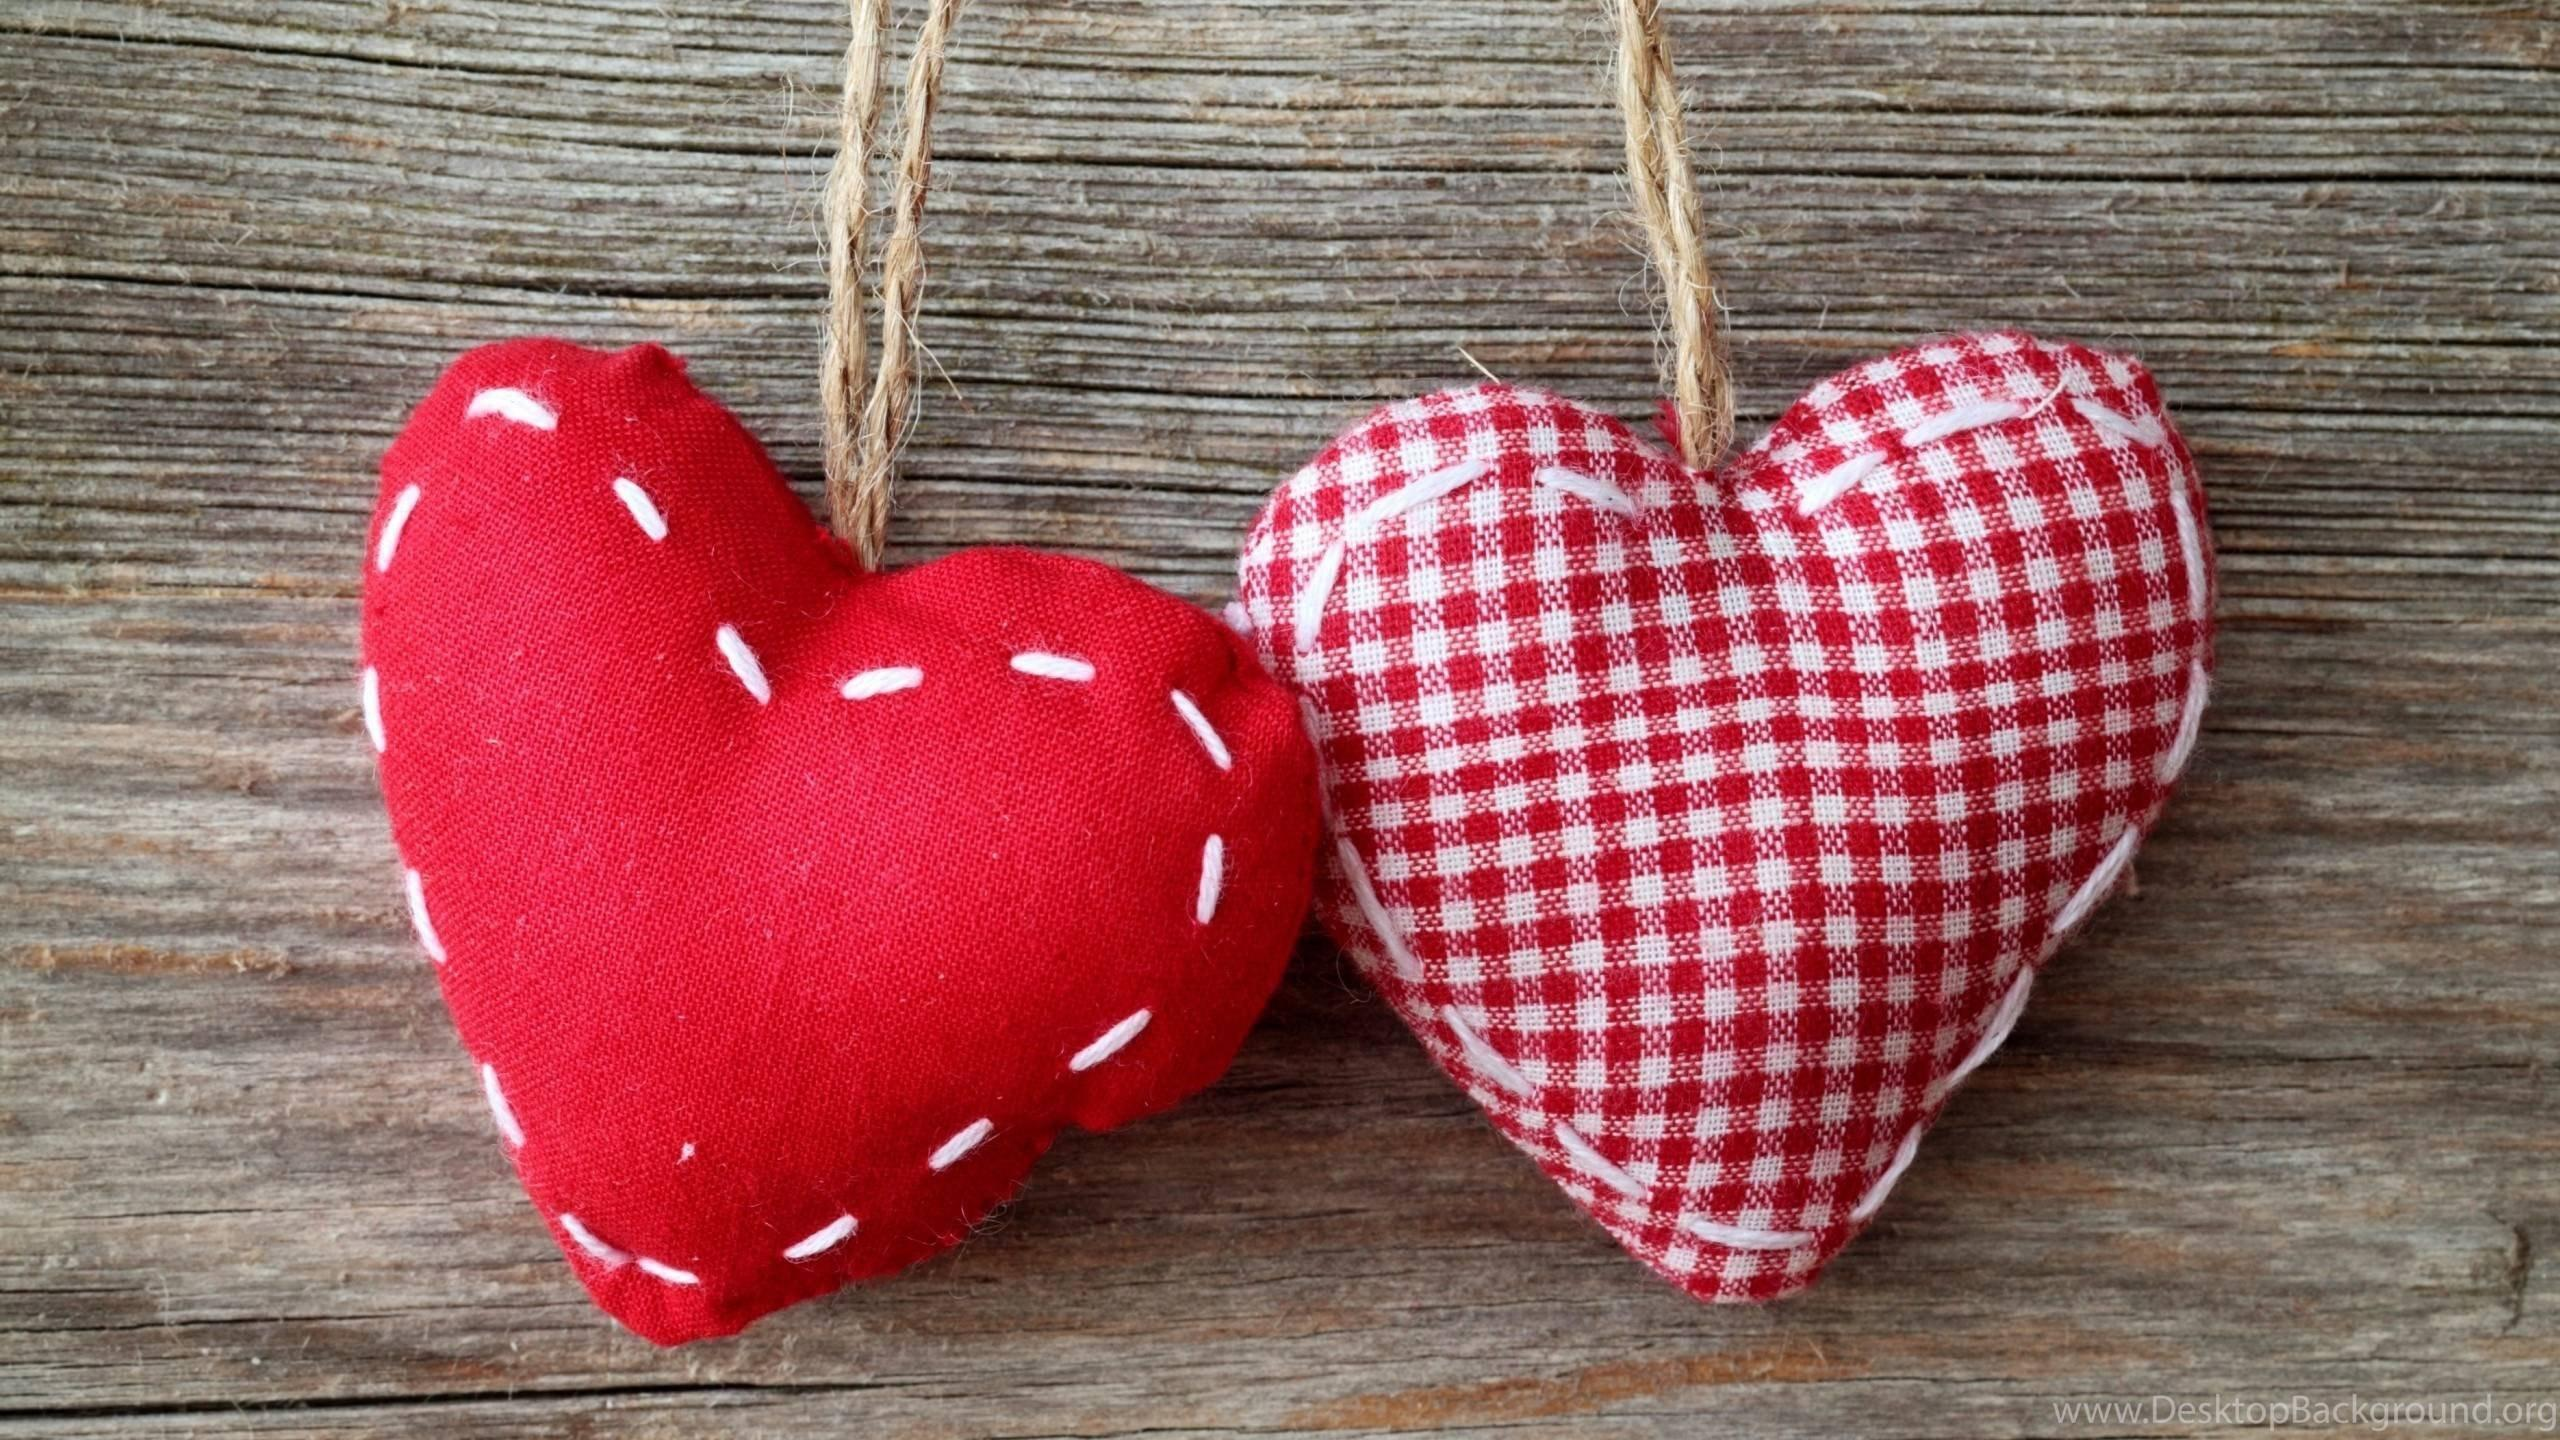 Whatsapp Wallpaper Hd Love Download Heart Images Hd Dp